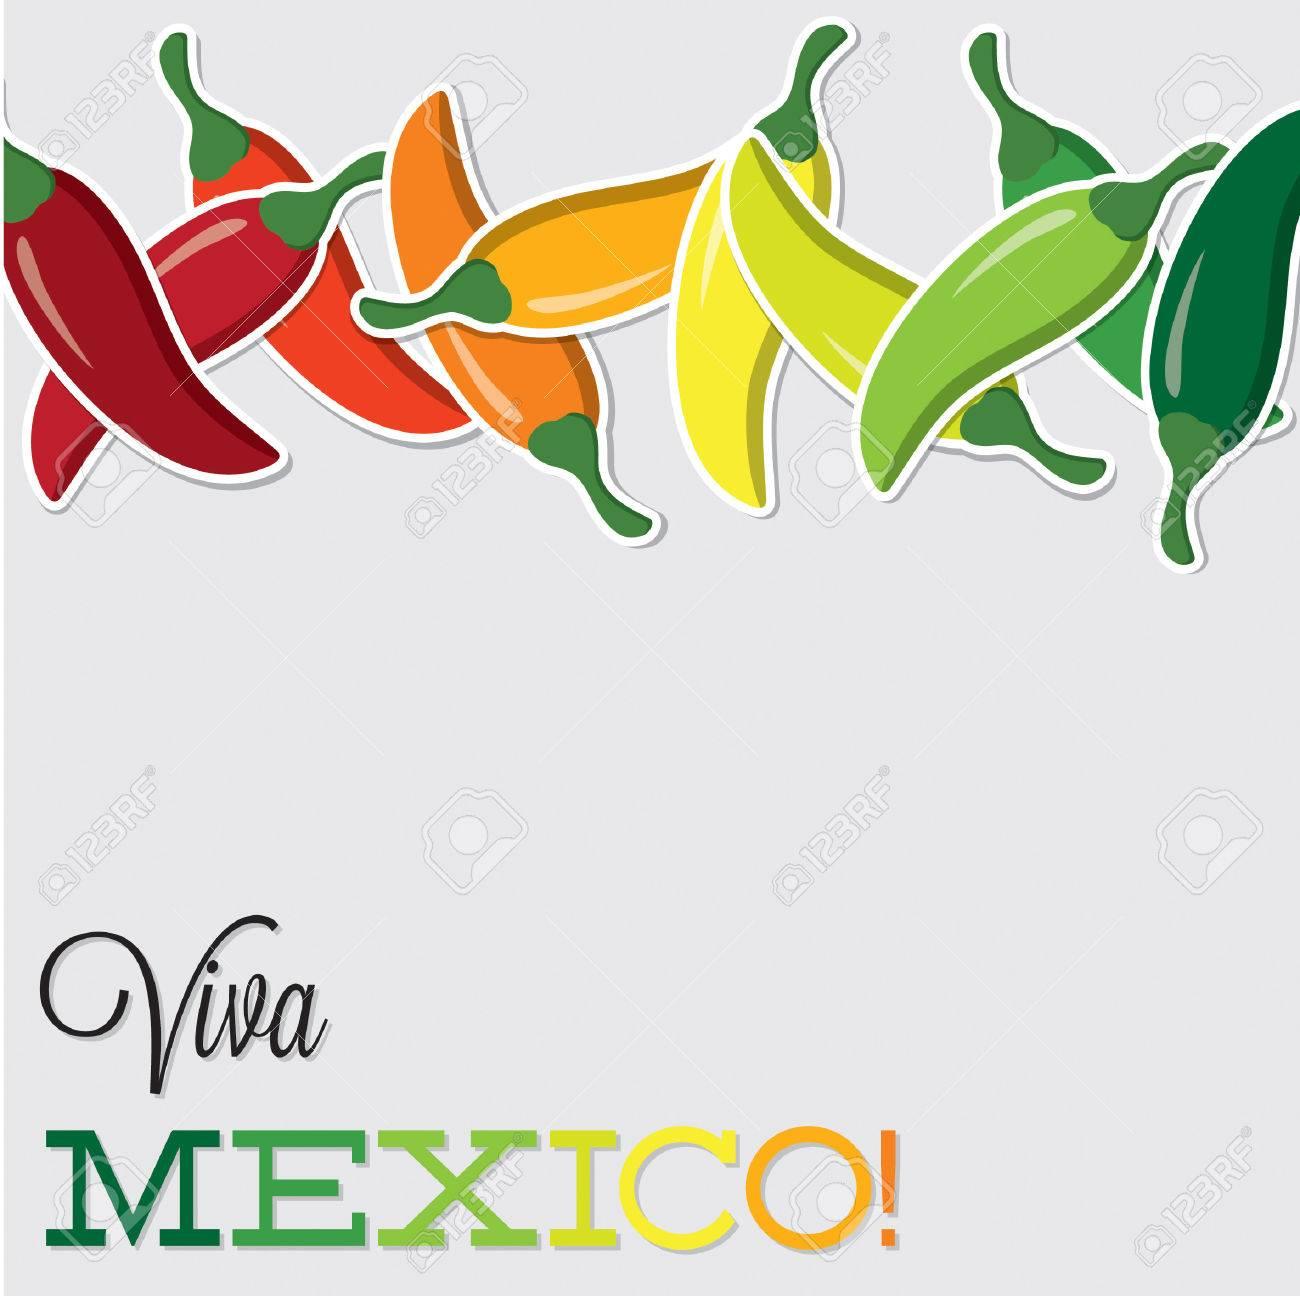 Viva Mexico chilli card in vector format - 27596838